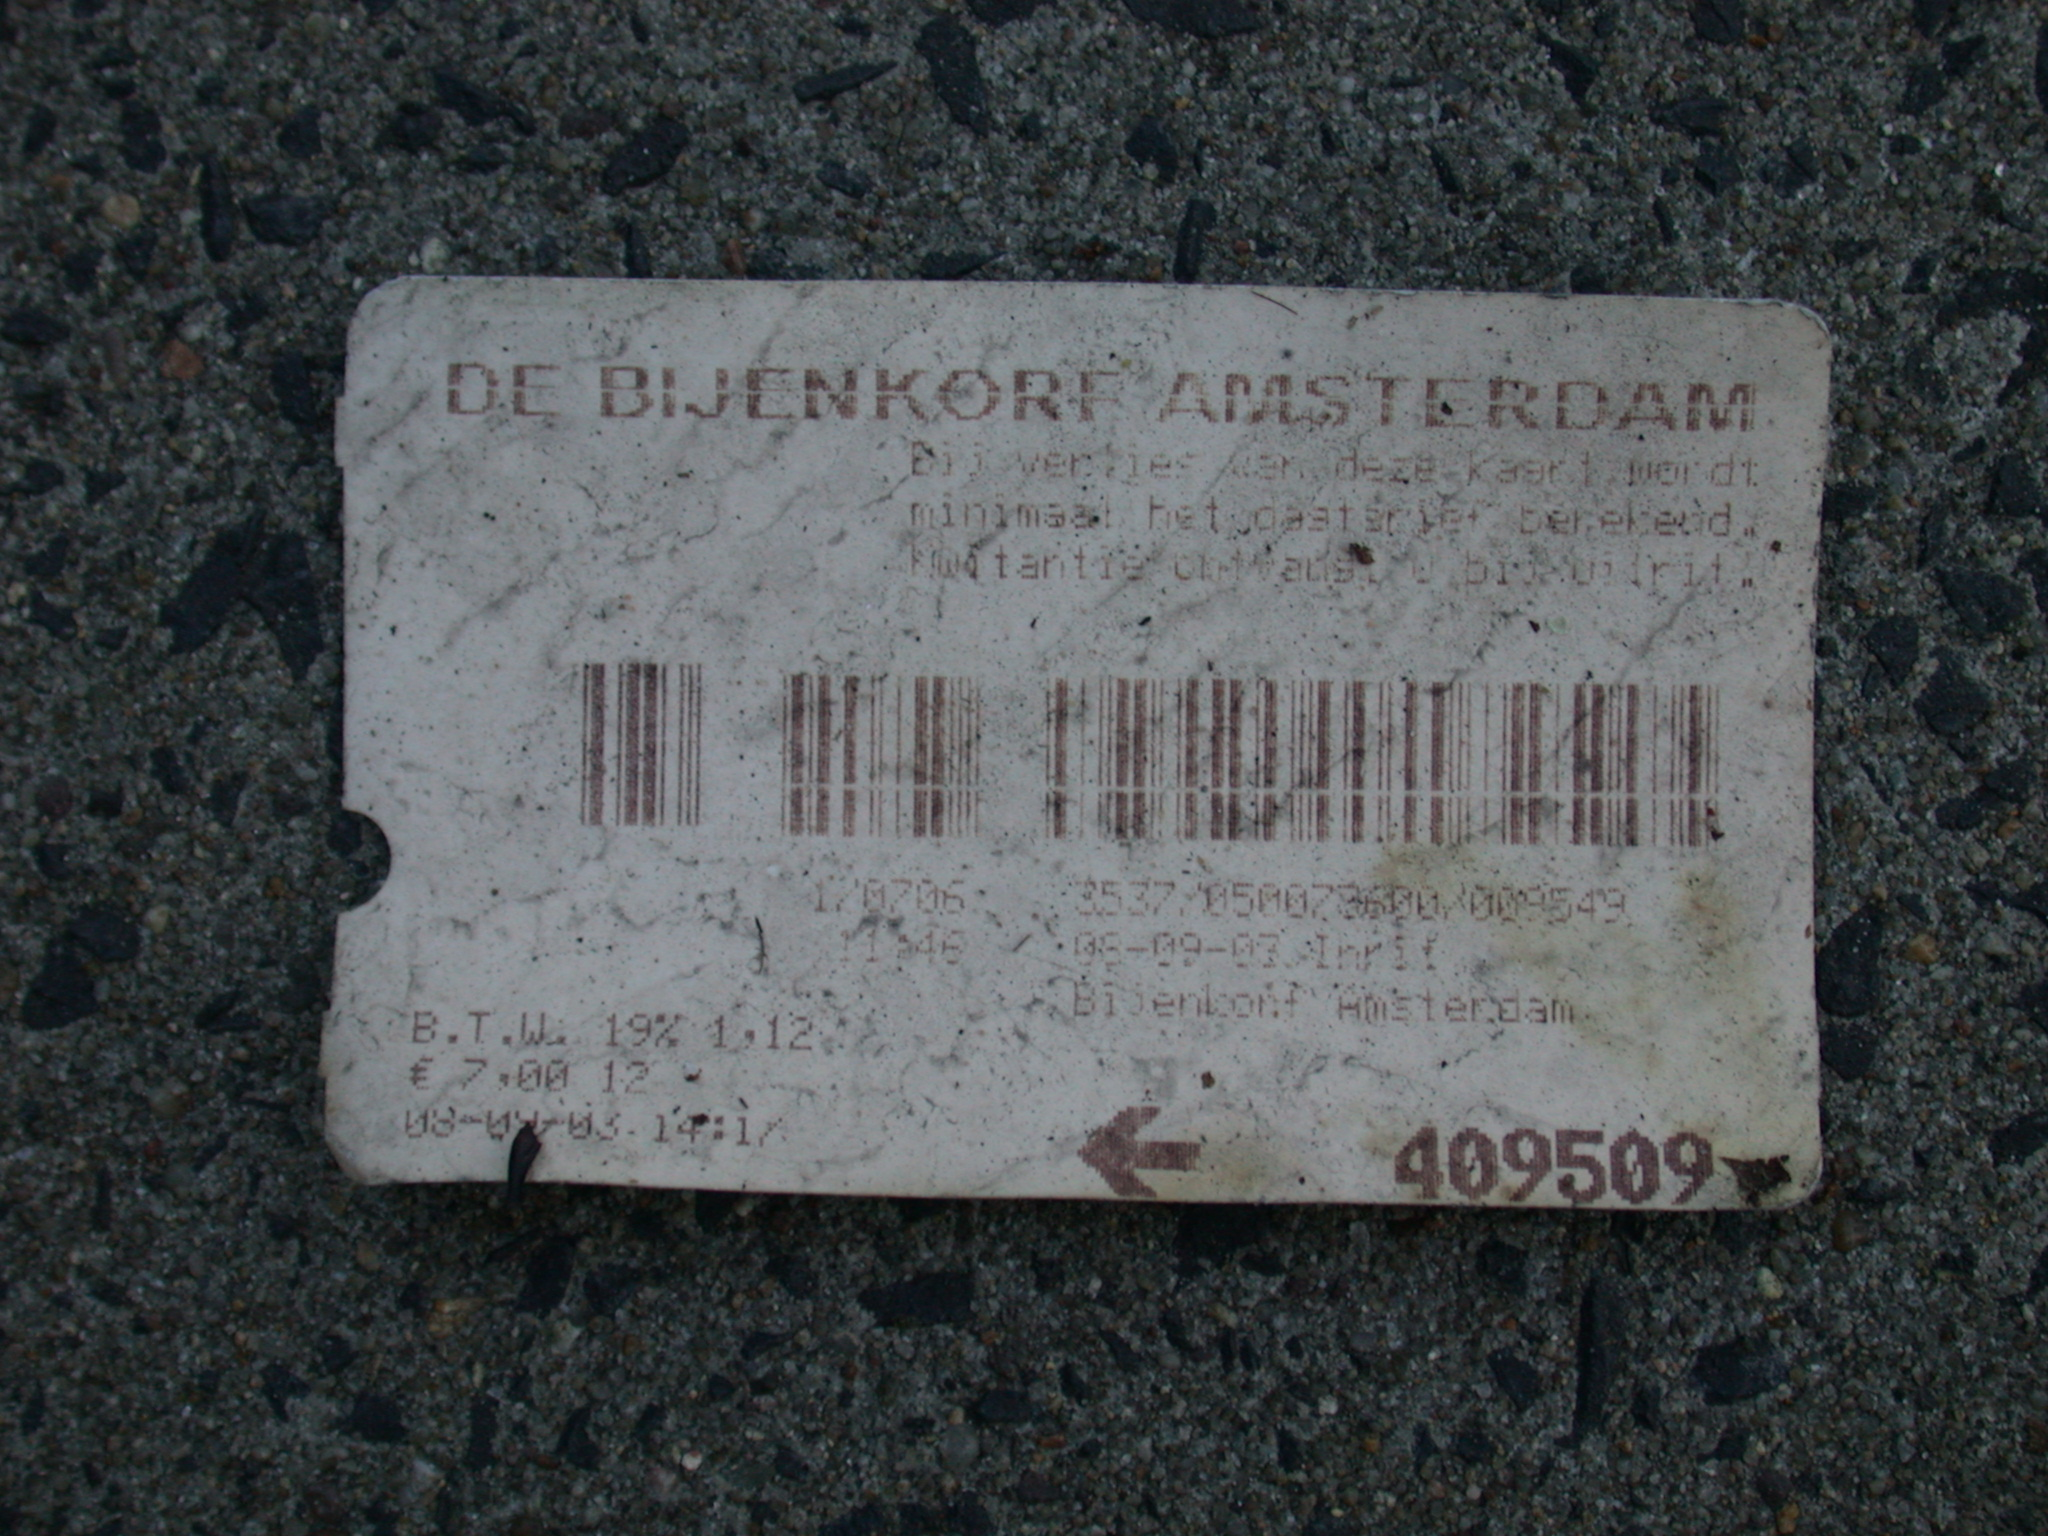 parking ticket de bijenkorf square piece of paper barcode royalty free